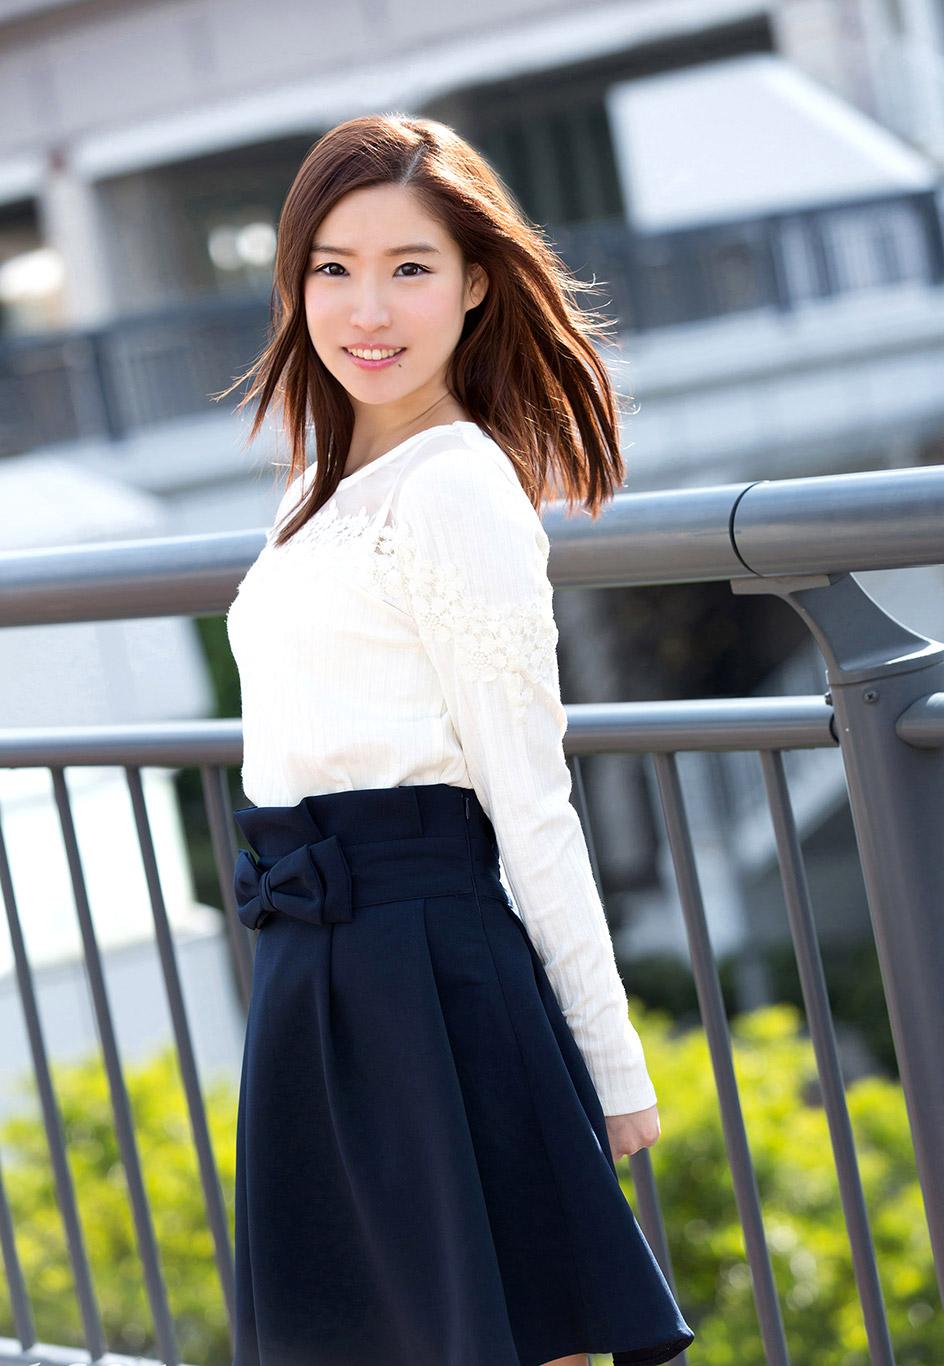 http://www.jjgirls.com/japanese/rena-sasamiya/1/rena-sasamiya-1.jpg